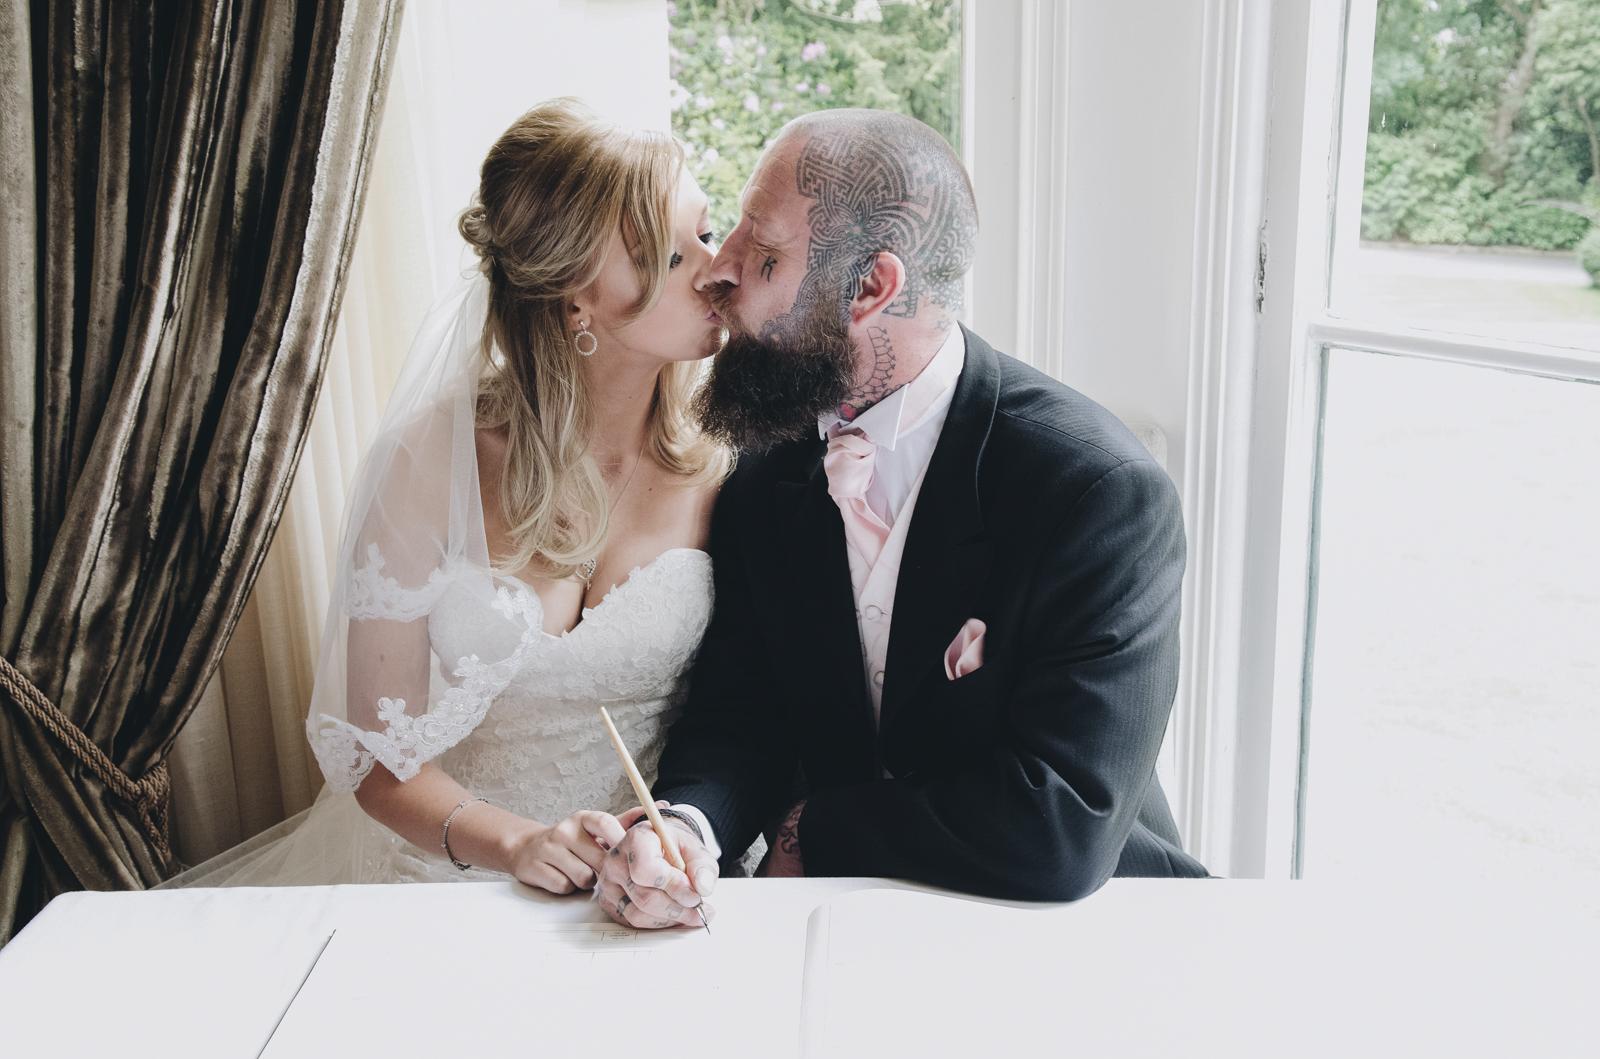 Alternative-North-West-Manchester-Wedding-Photography-Astley-bank-Wedding-skull-cake-tattooed-groom-13.jpg